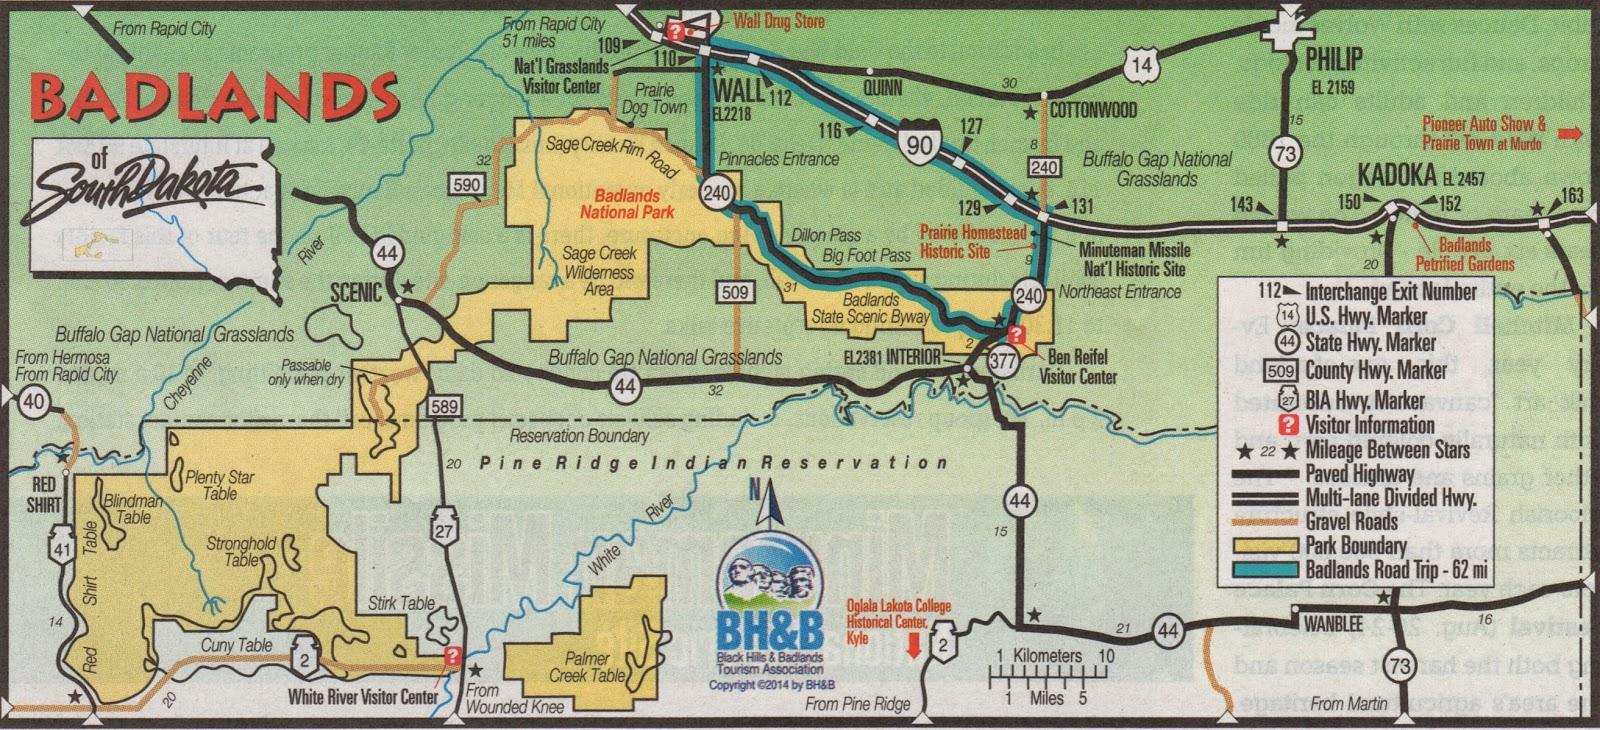 Badlands Nebraska Map.It S Fun 4 Me The Great American Road Trip Badlands National Park